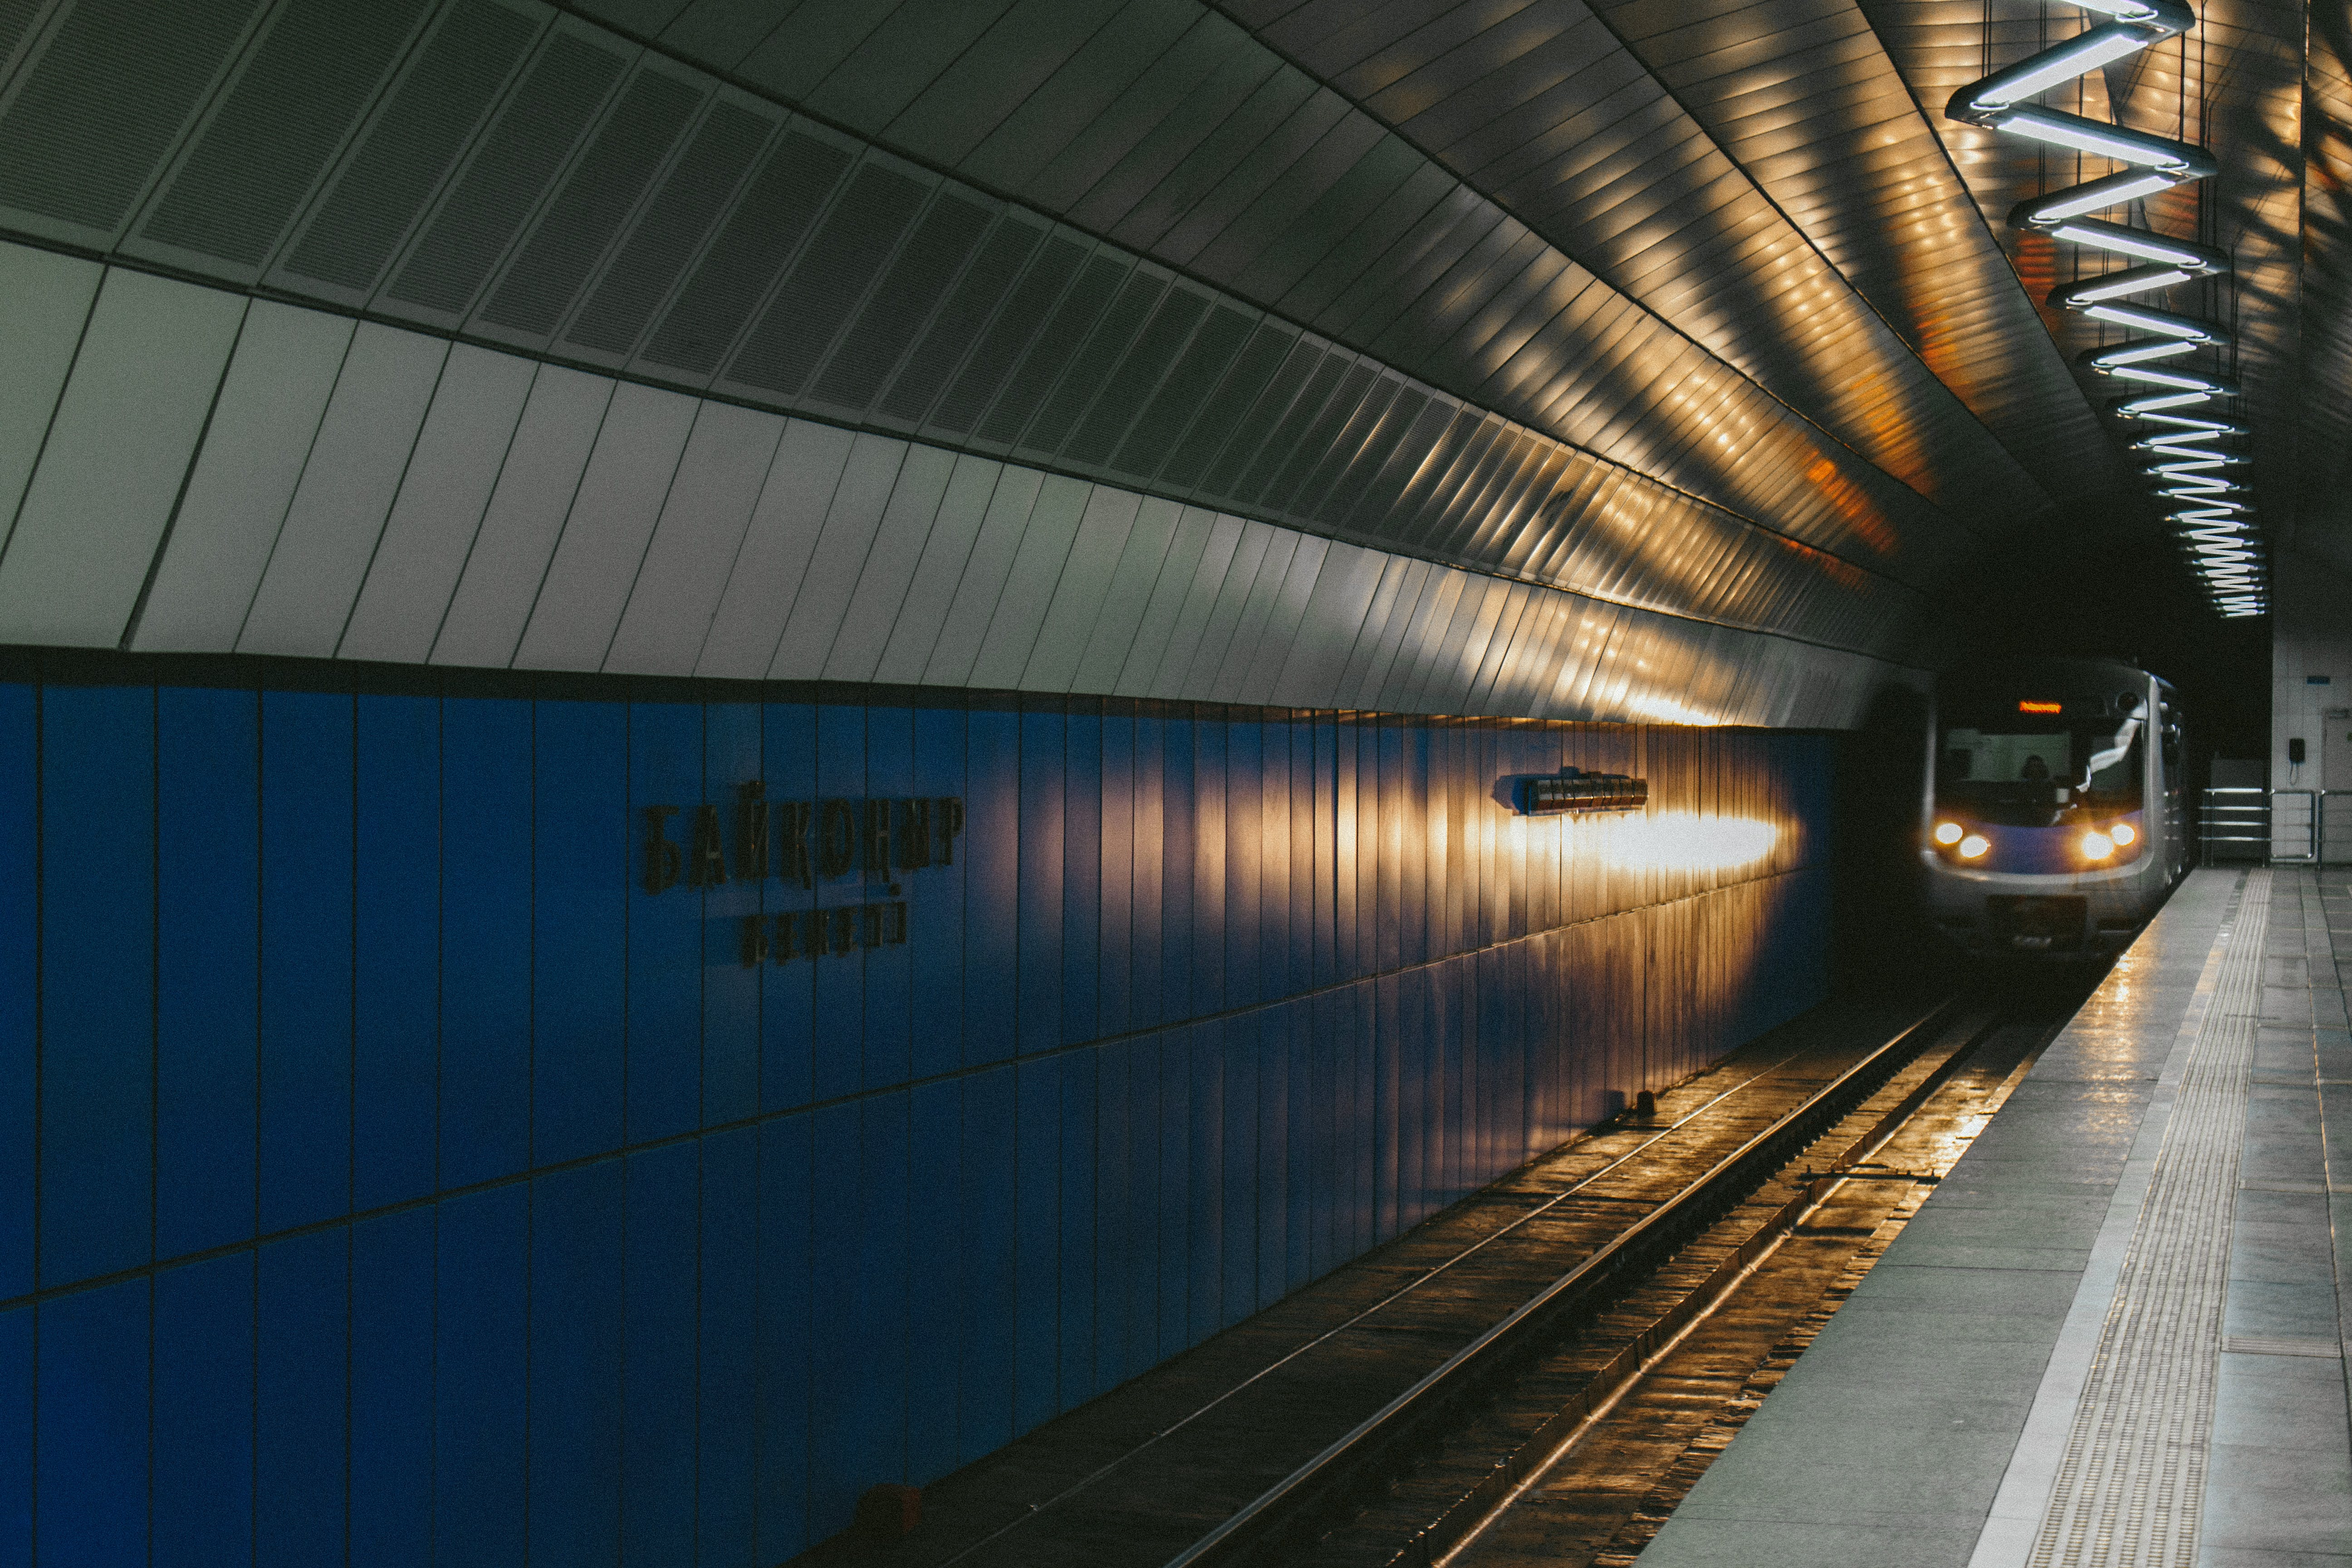 Free stock photo of lights, subway, subway platform, subway station